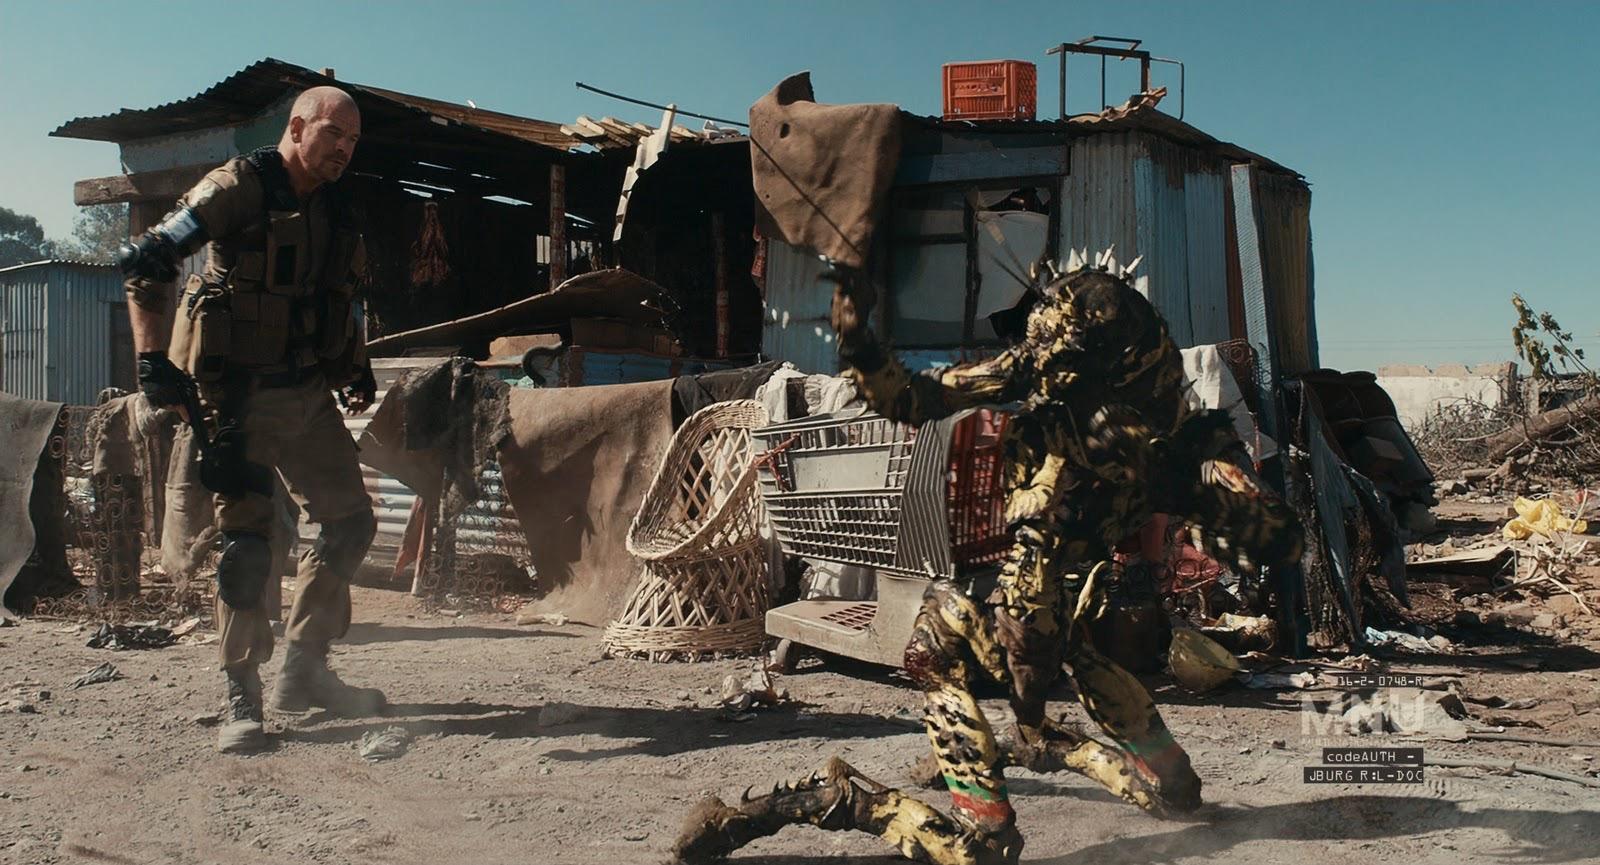 MNU harass the Prawns in District 9 (2009)